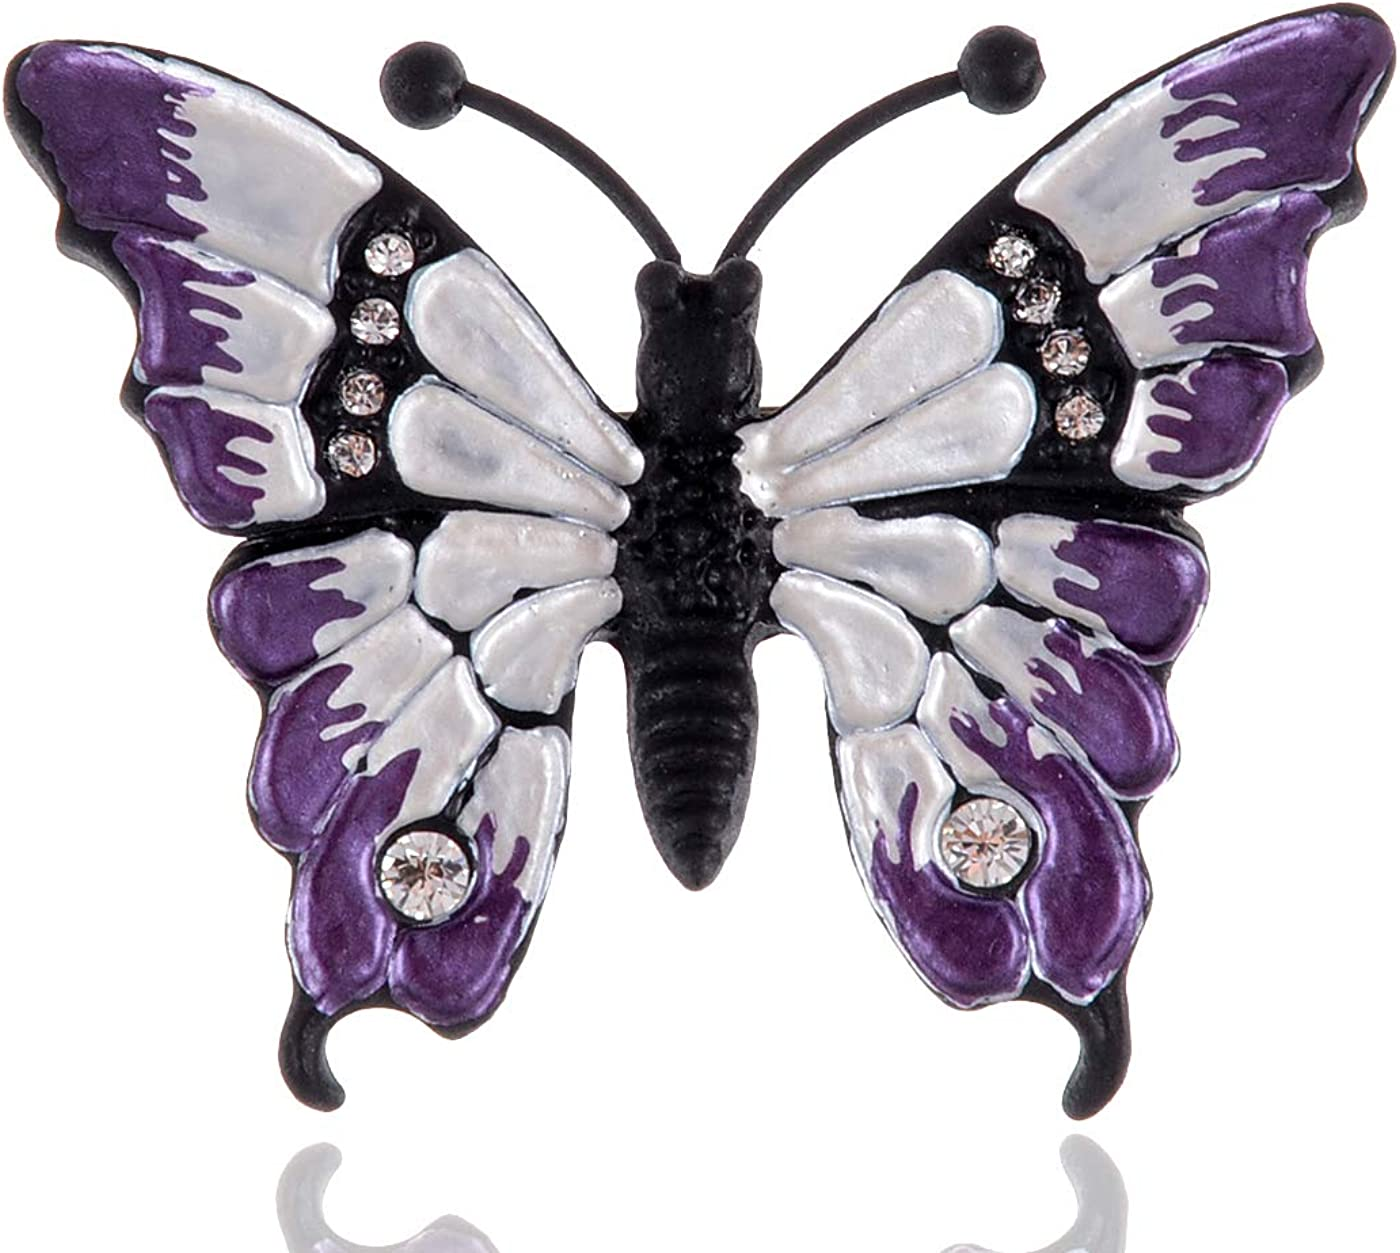 Alilang Dazzling Romantic Shine Crystal Rhinestones Butterfly Enamel Paint Fashion Brooch Pin